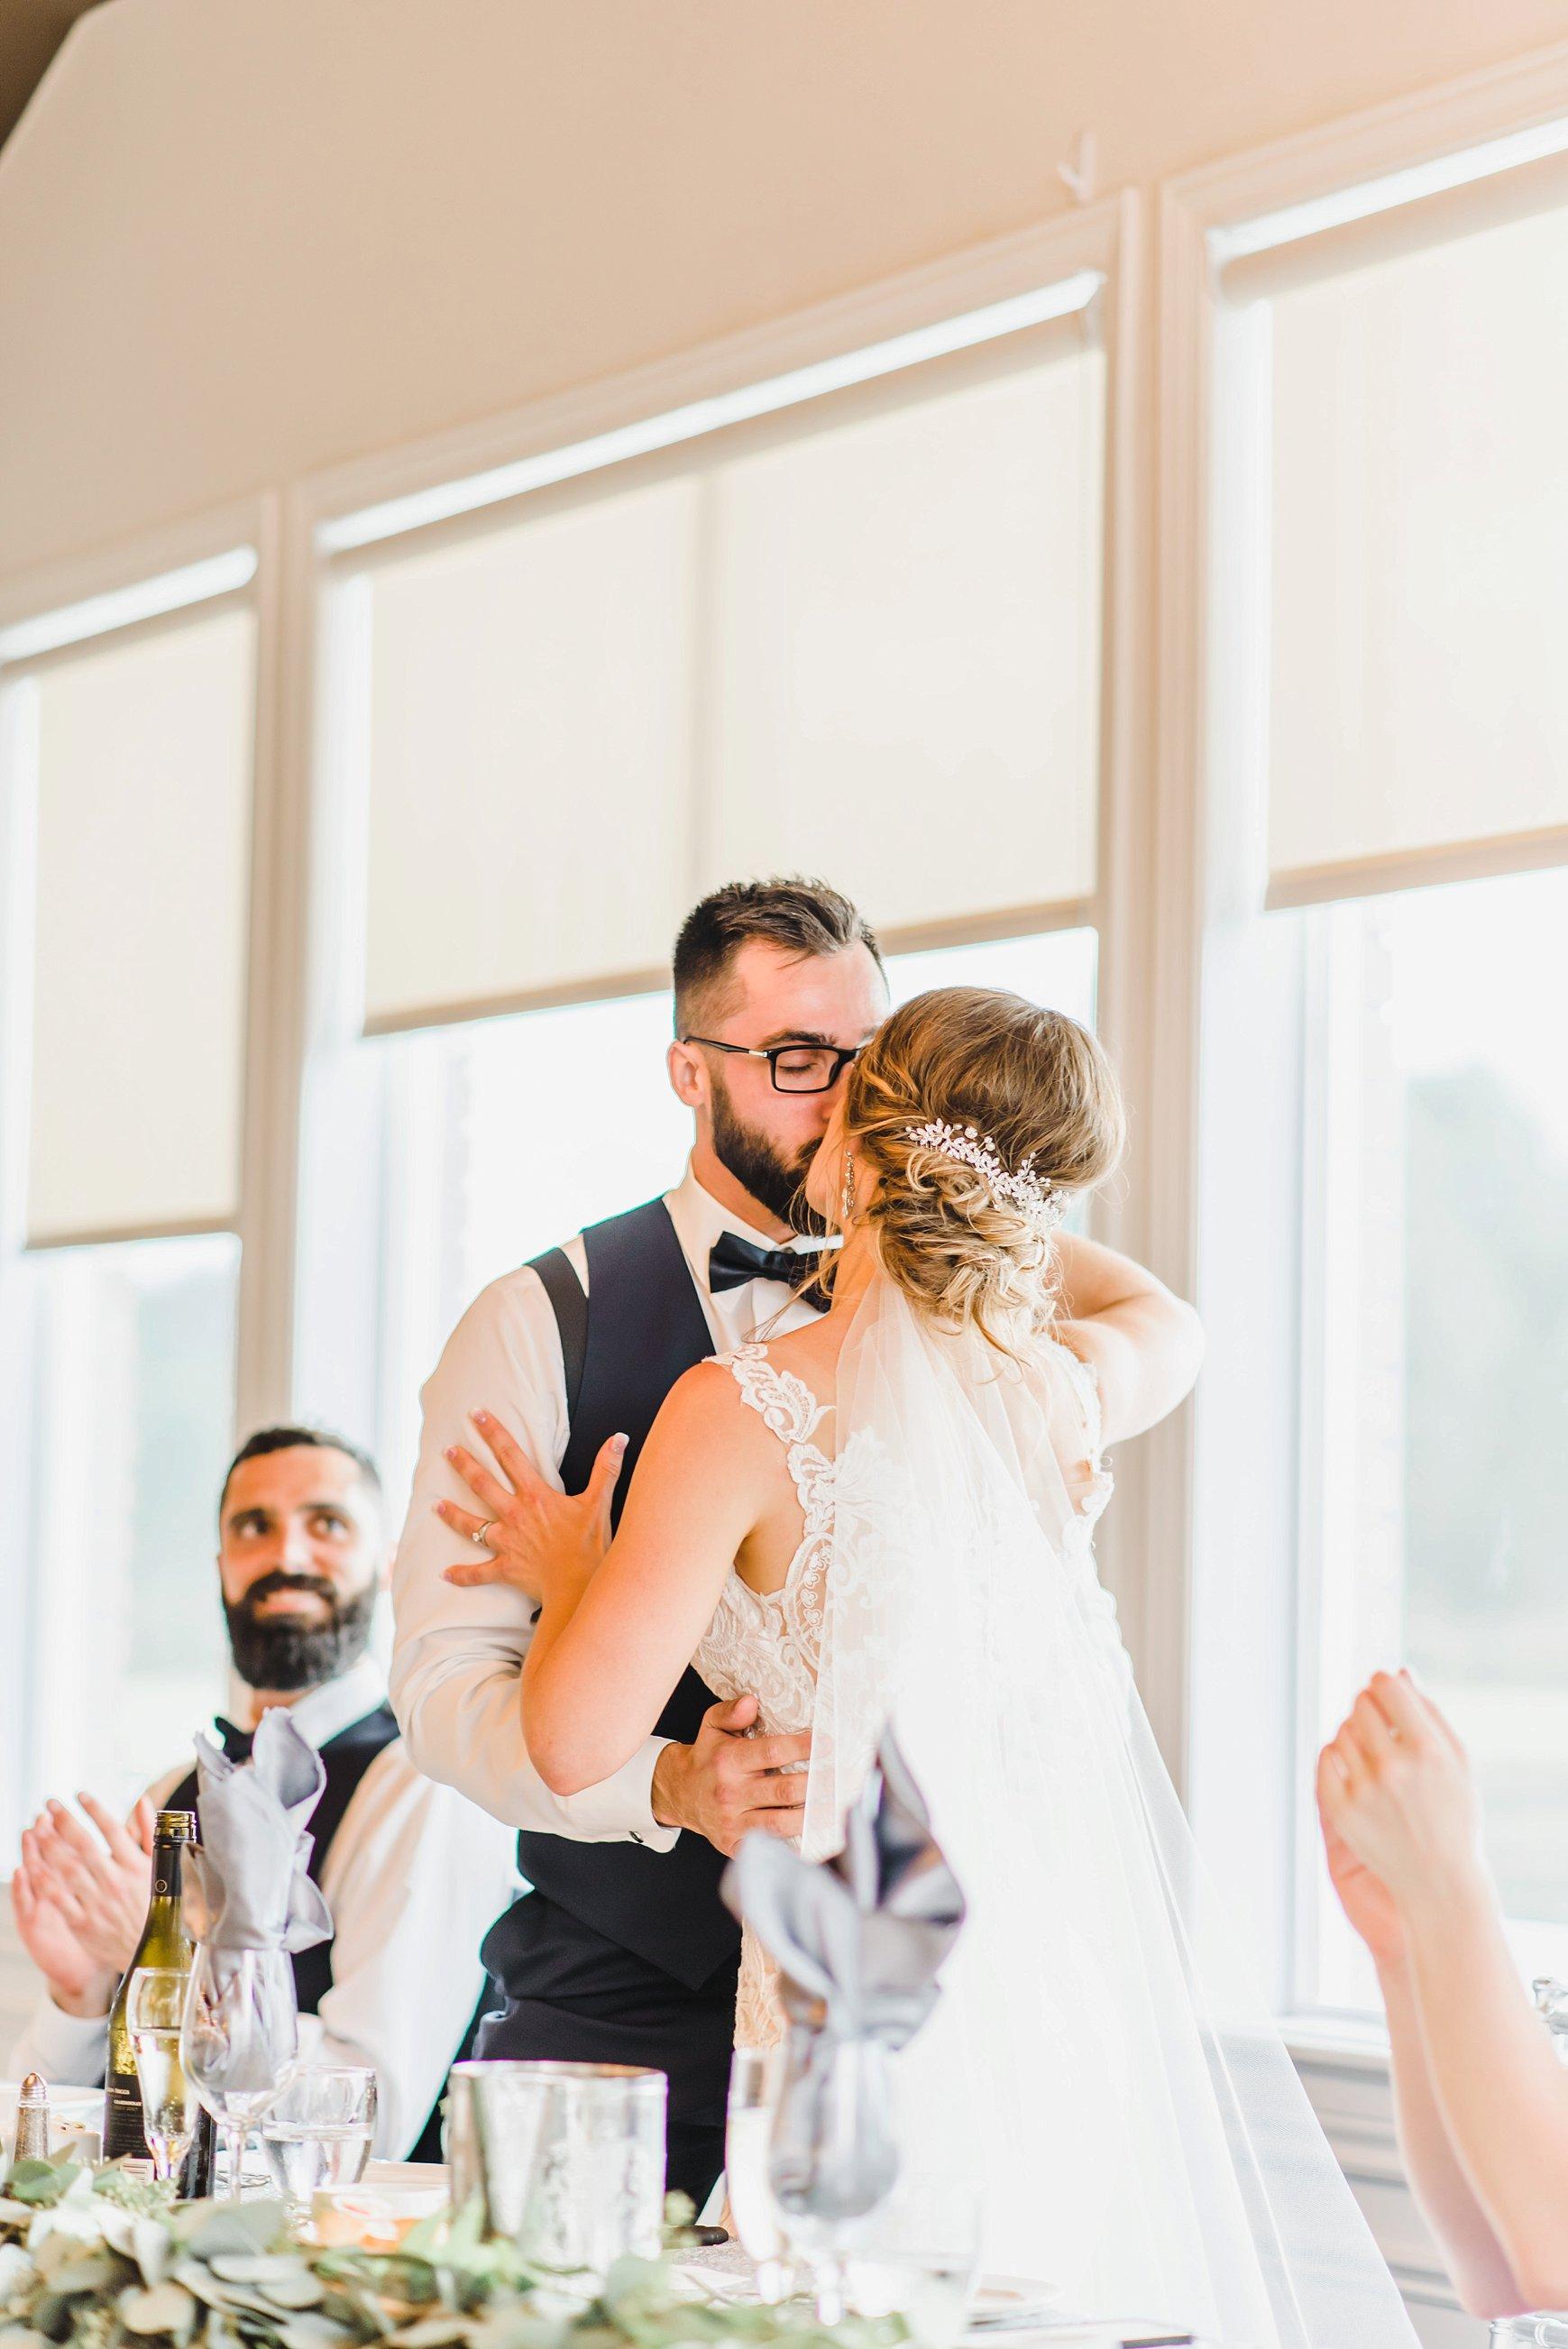 light airy indie fine art ottawa wedding photographer | Ali and Batoul Photography_1344.jpg